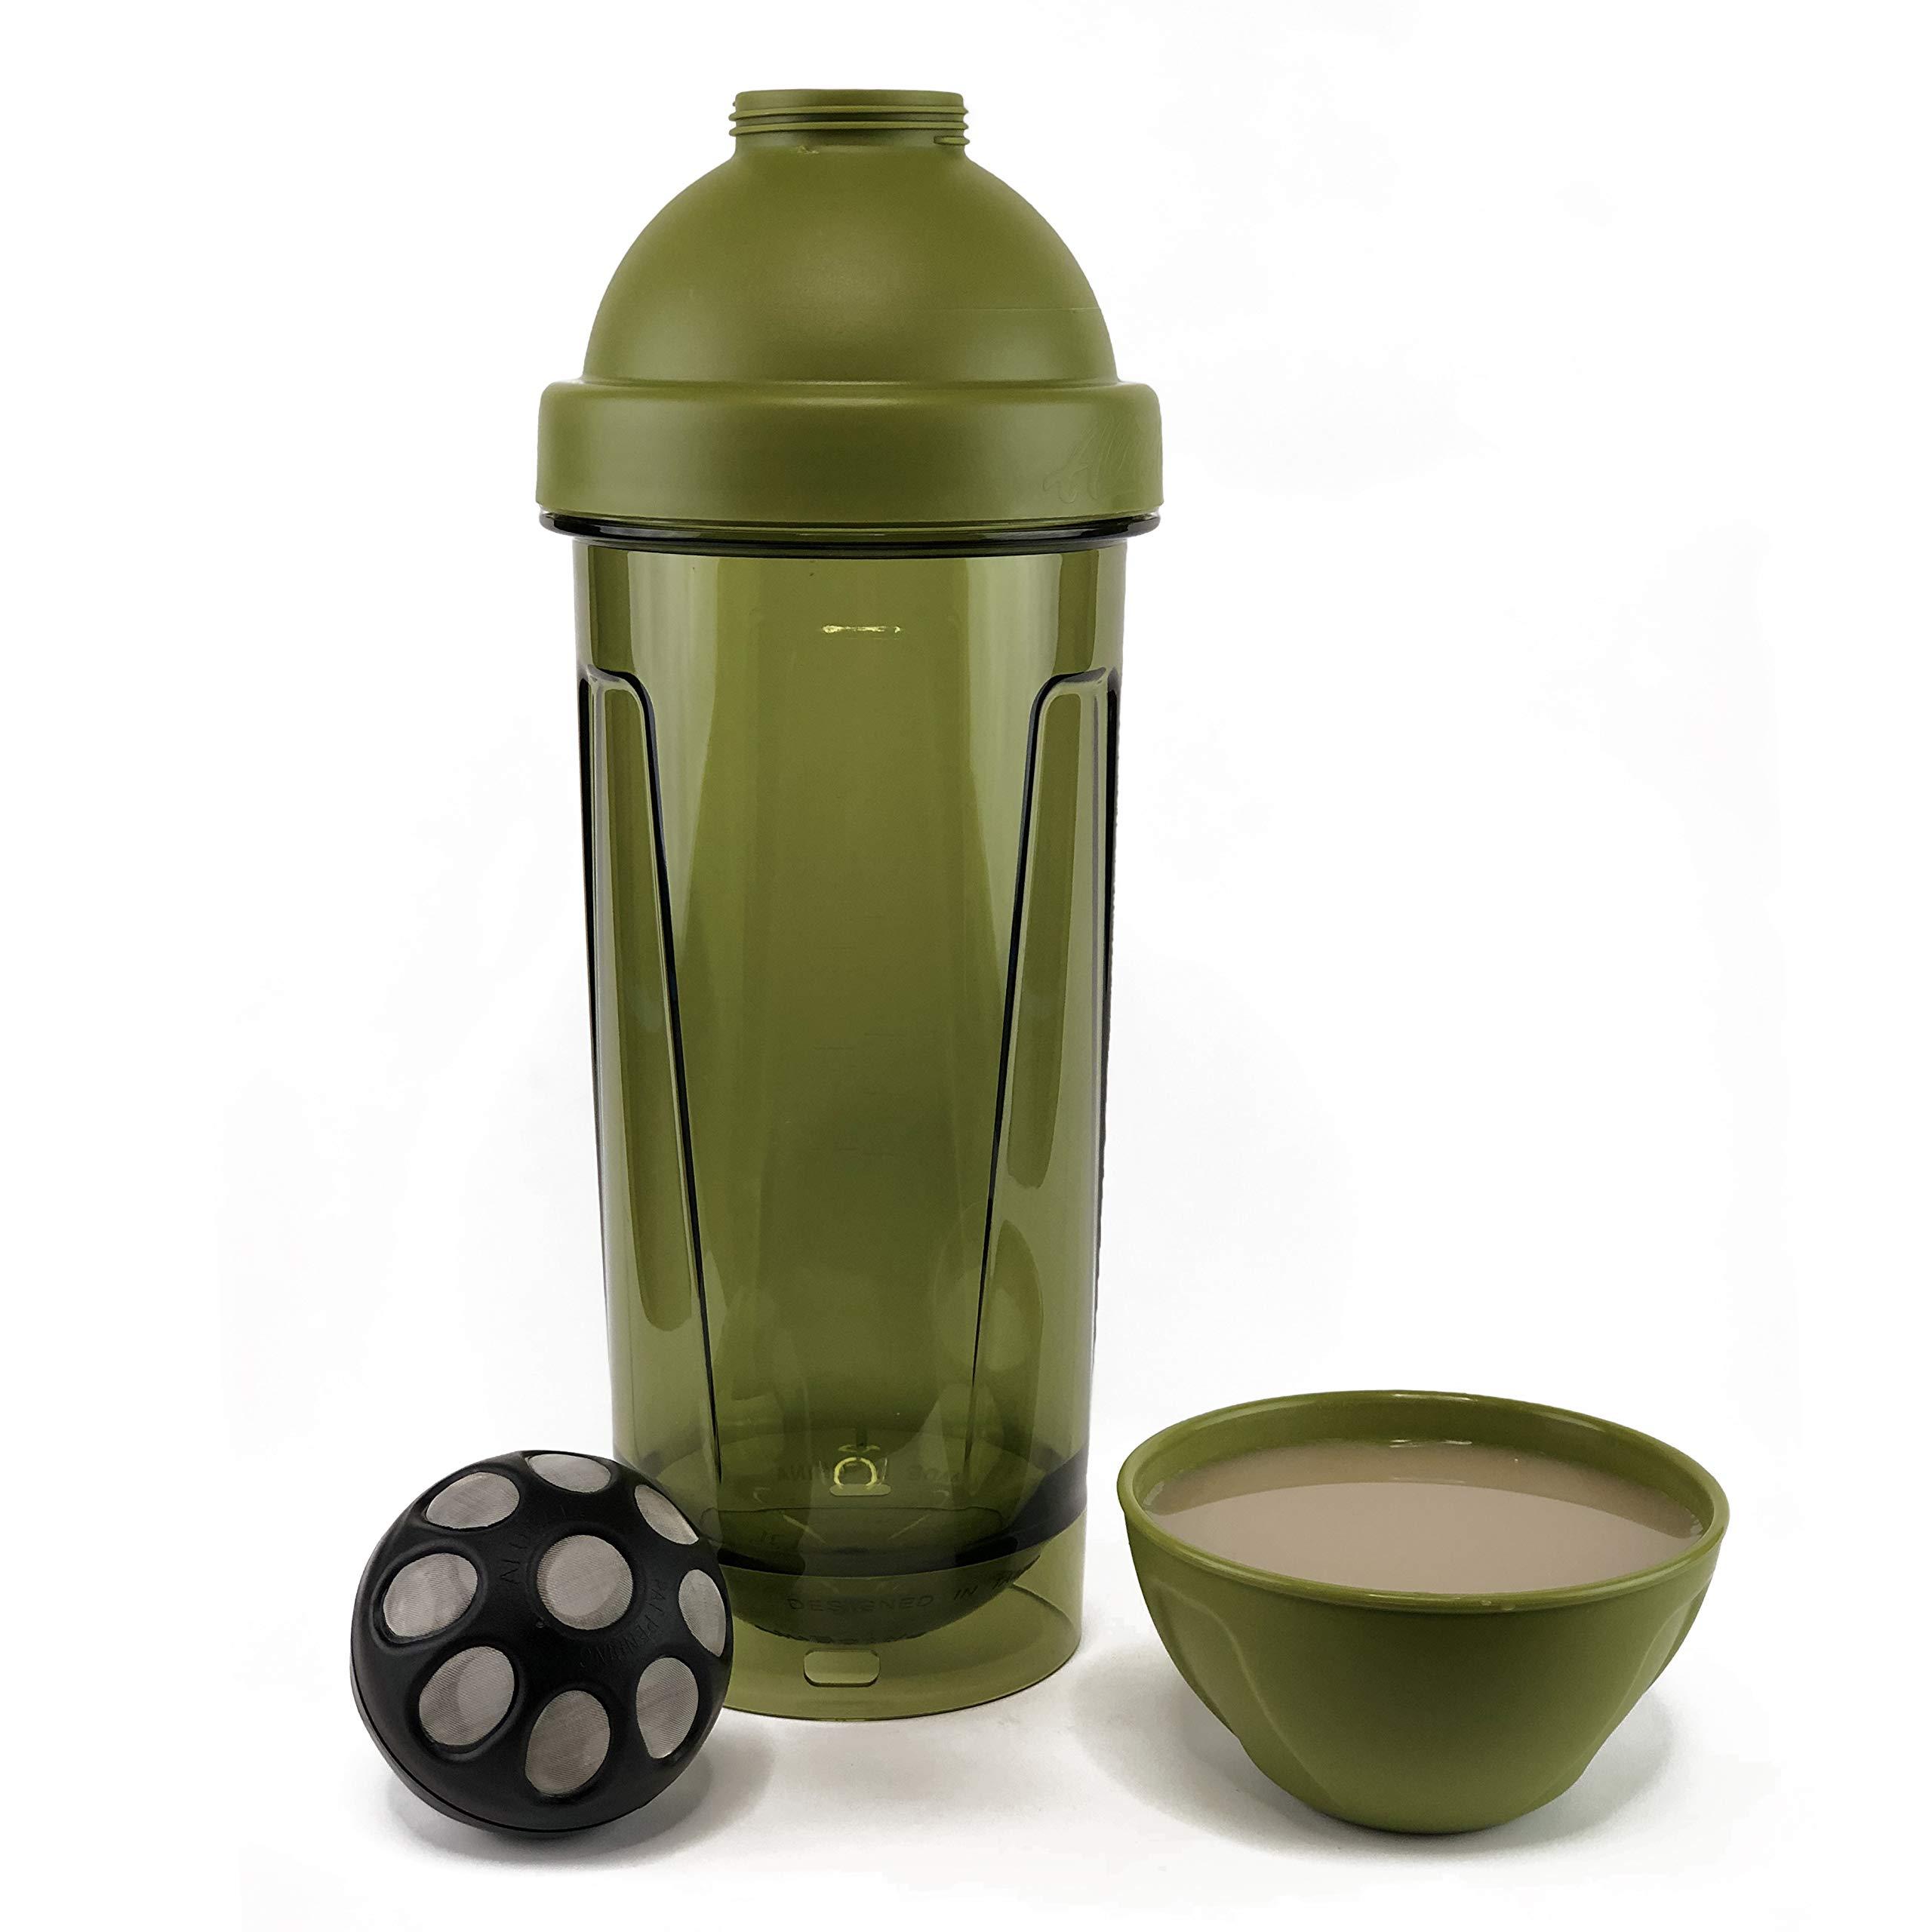 Kavafied AluBall Pro Kava Maker ('Awa Green)